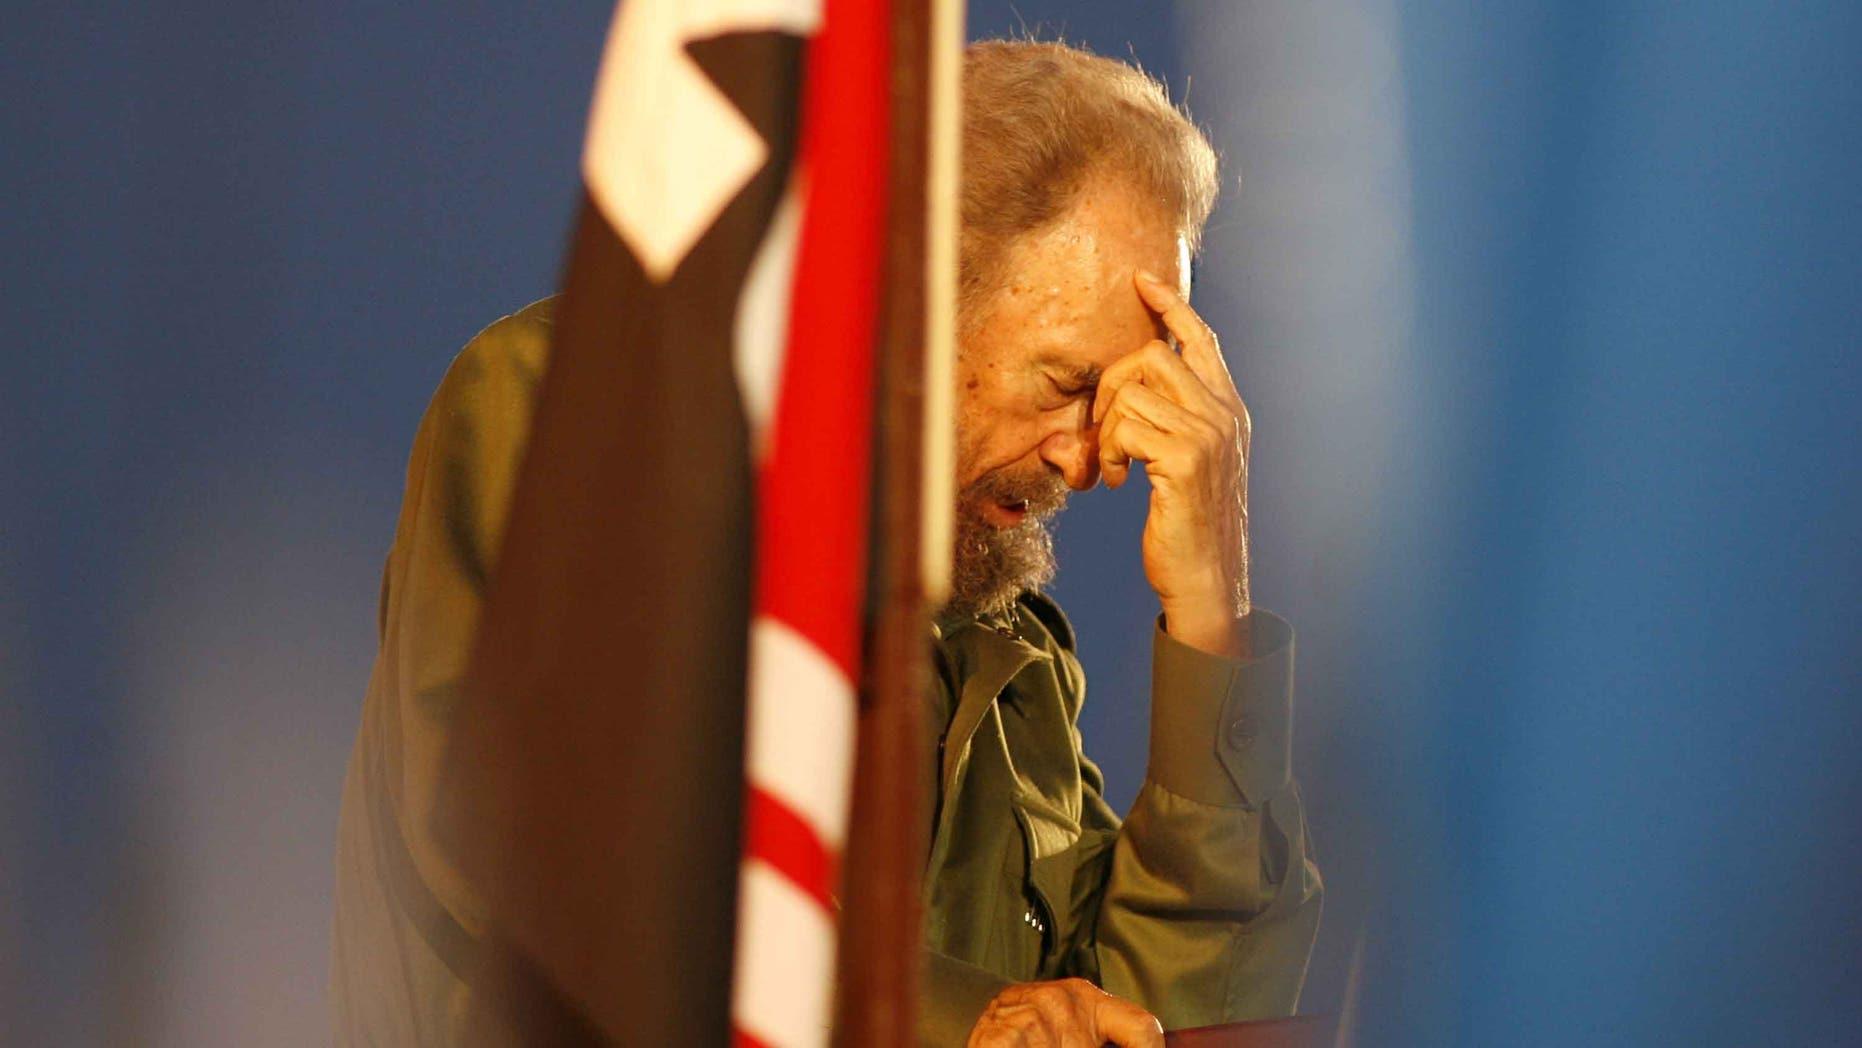 Cuban leader Fidel Castro in a July 26, 2006 file photo.